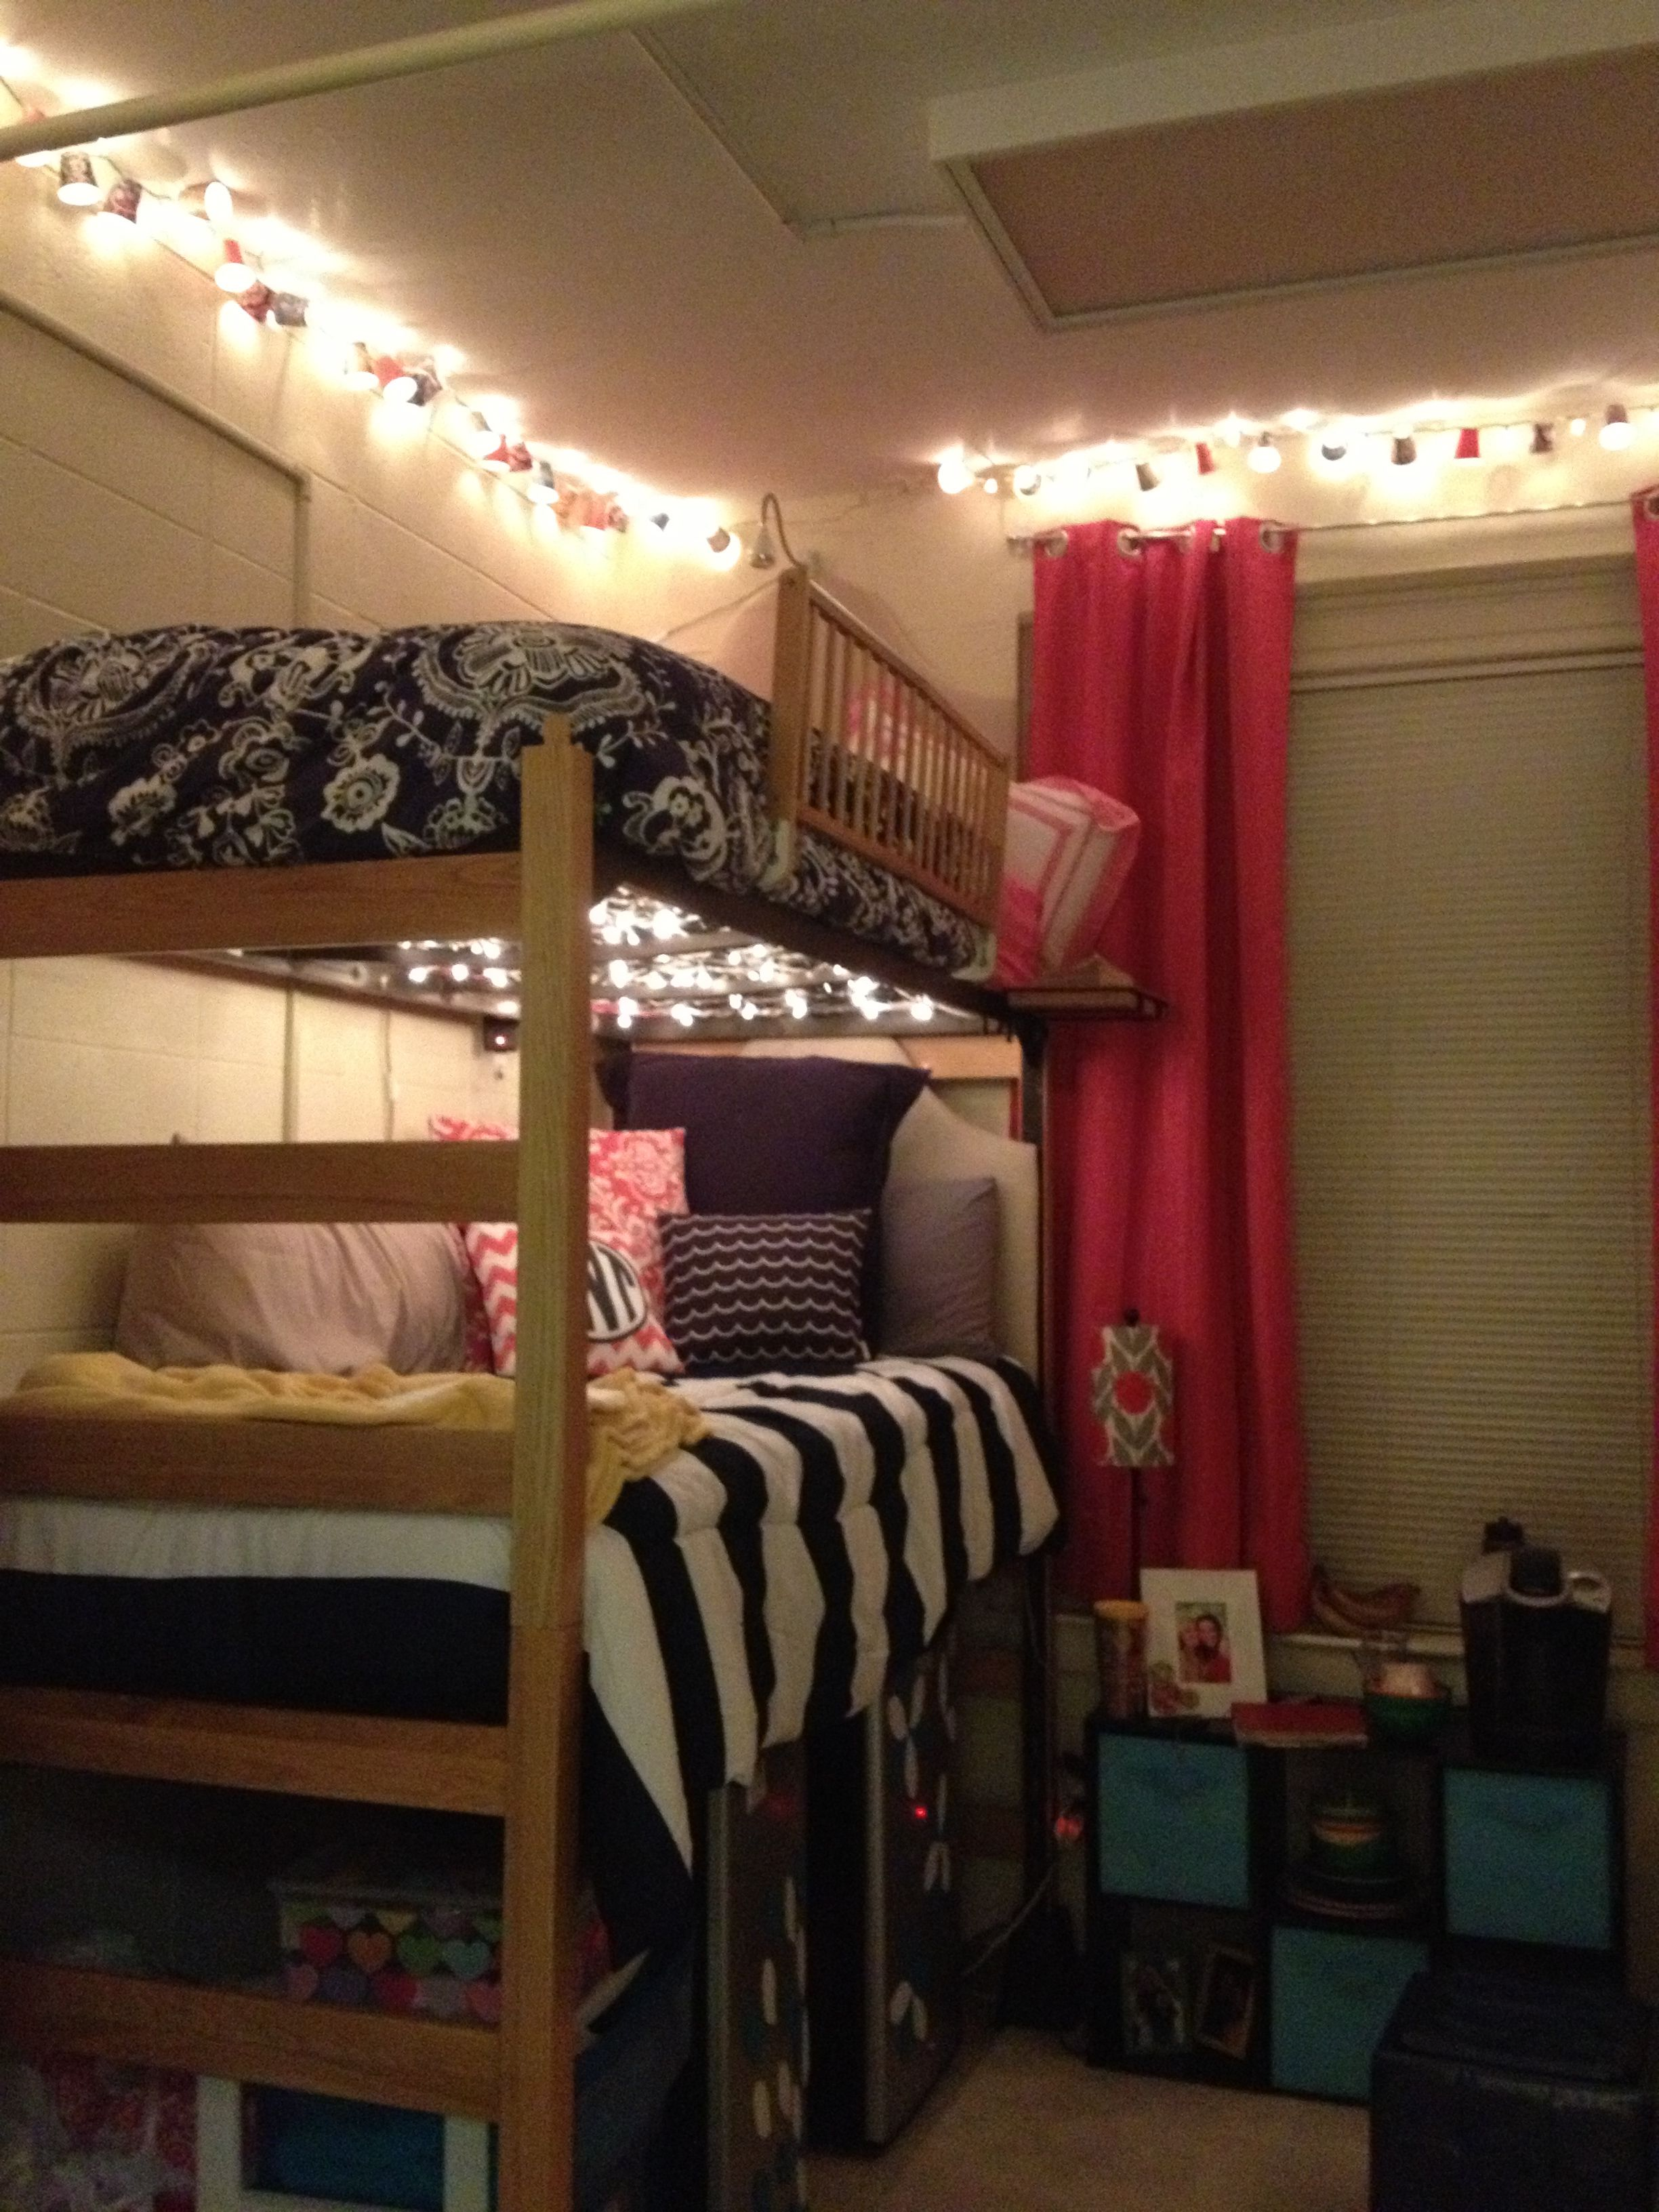 Dream Dorm Room: Cozy Dorm Room:)